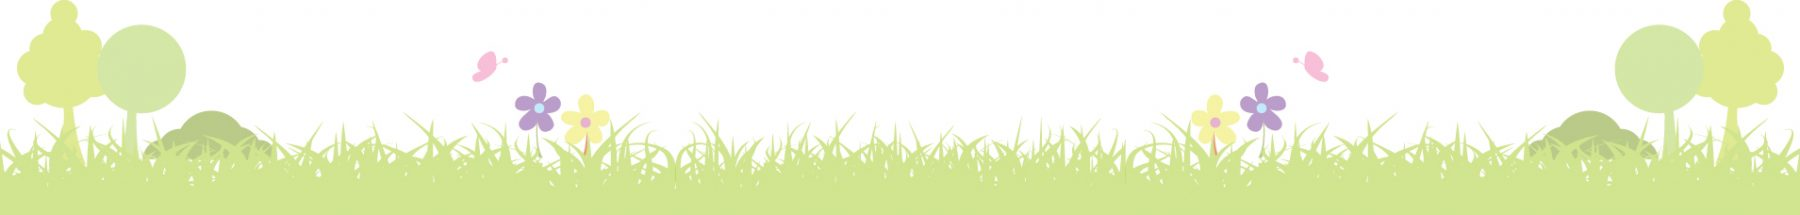 bg-grass-pattern